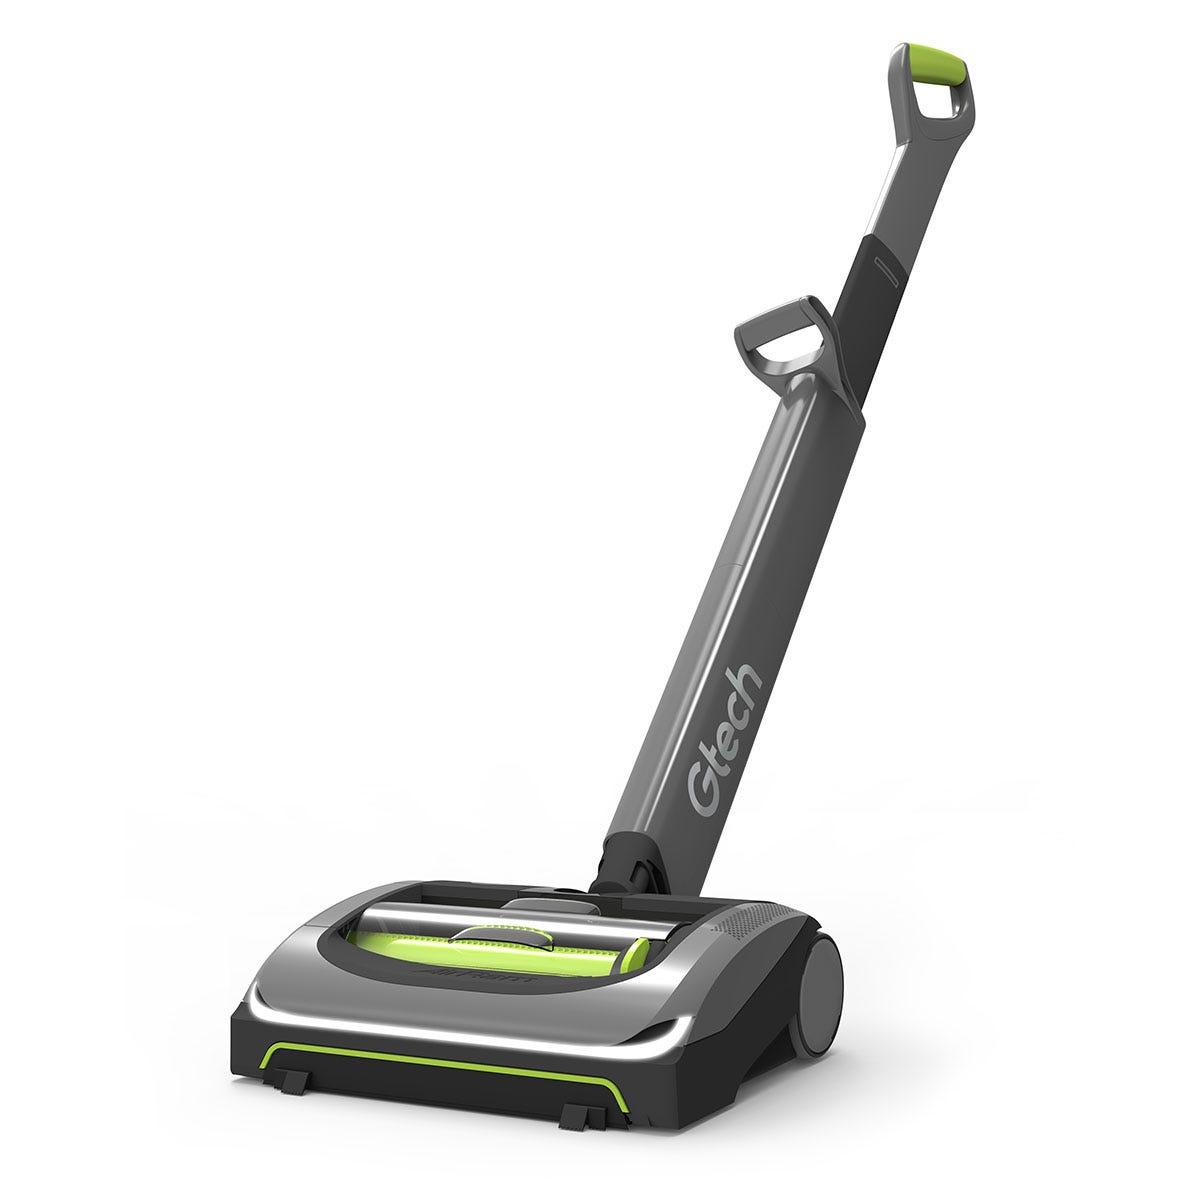 Gtech 1-03-148 AirRam Vacuum Cleaner - Grey & Green